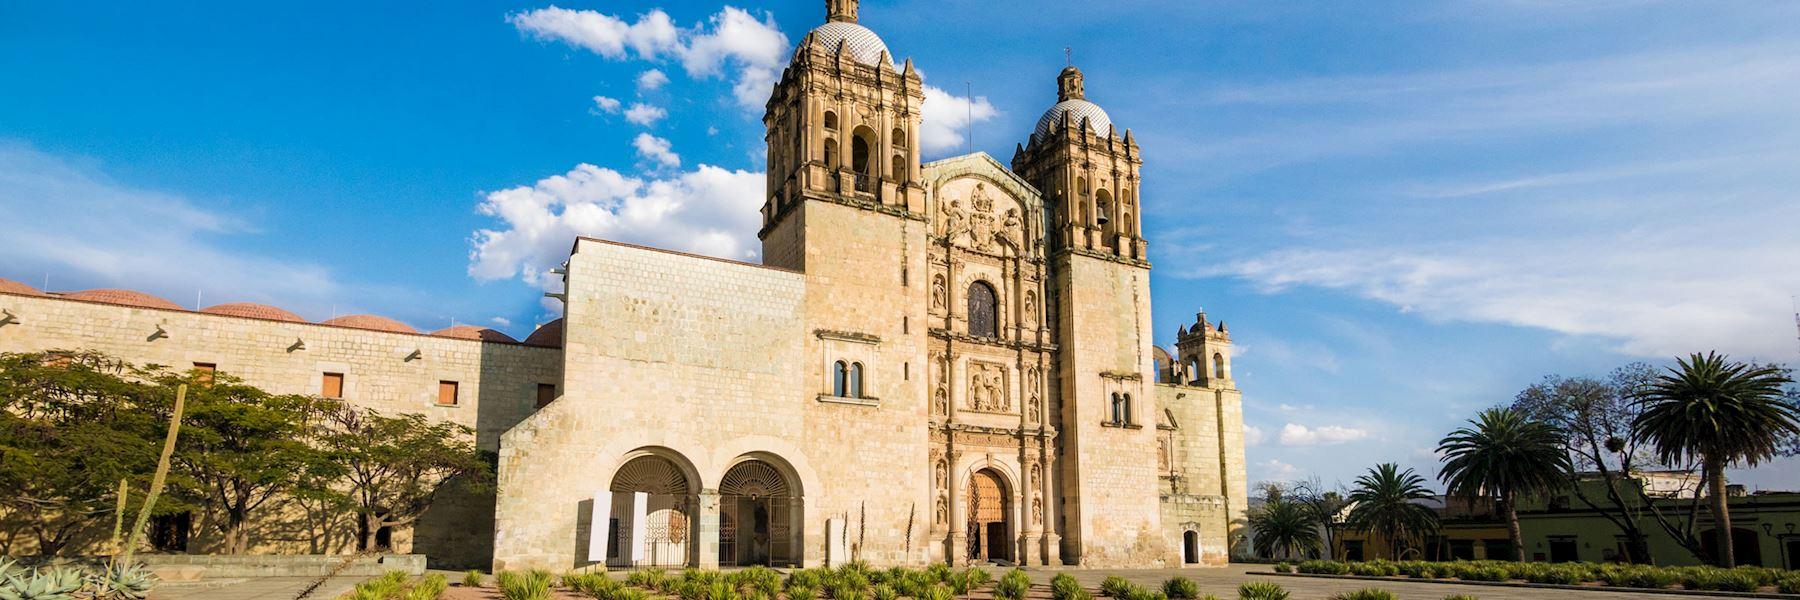 Visit Oaxaca, Mexico